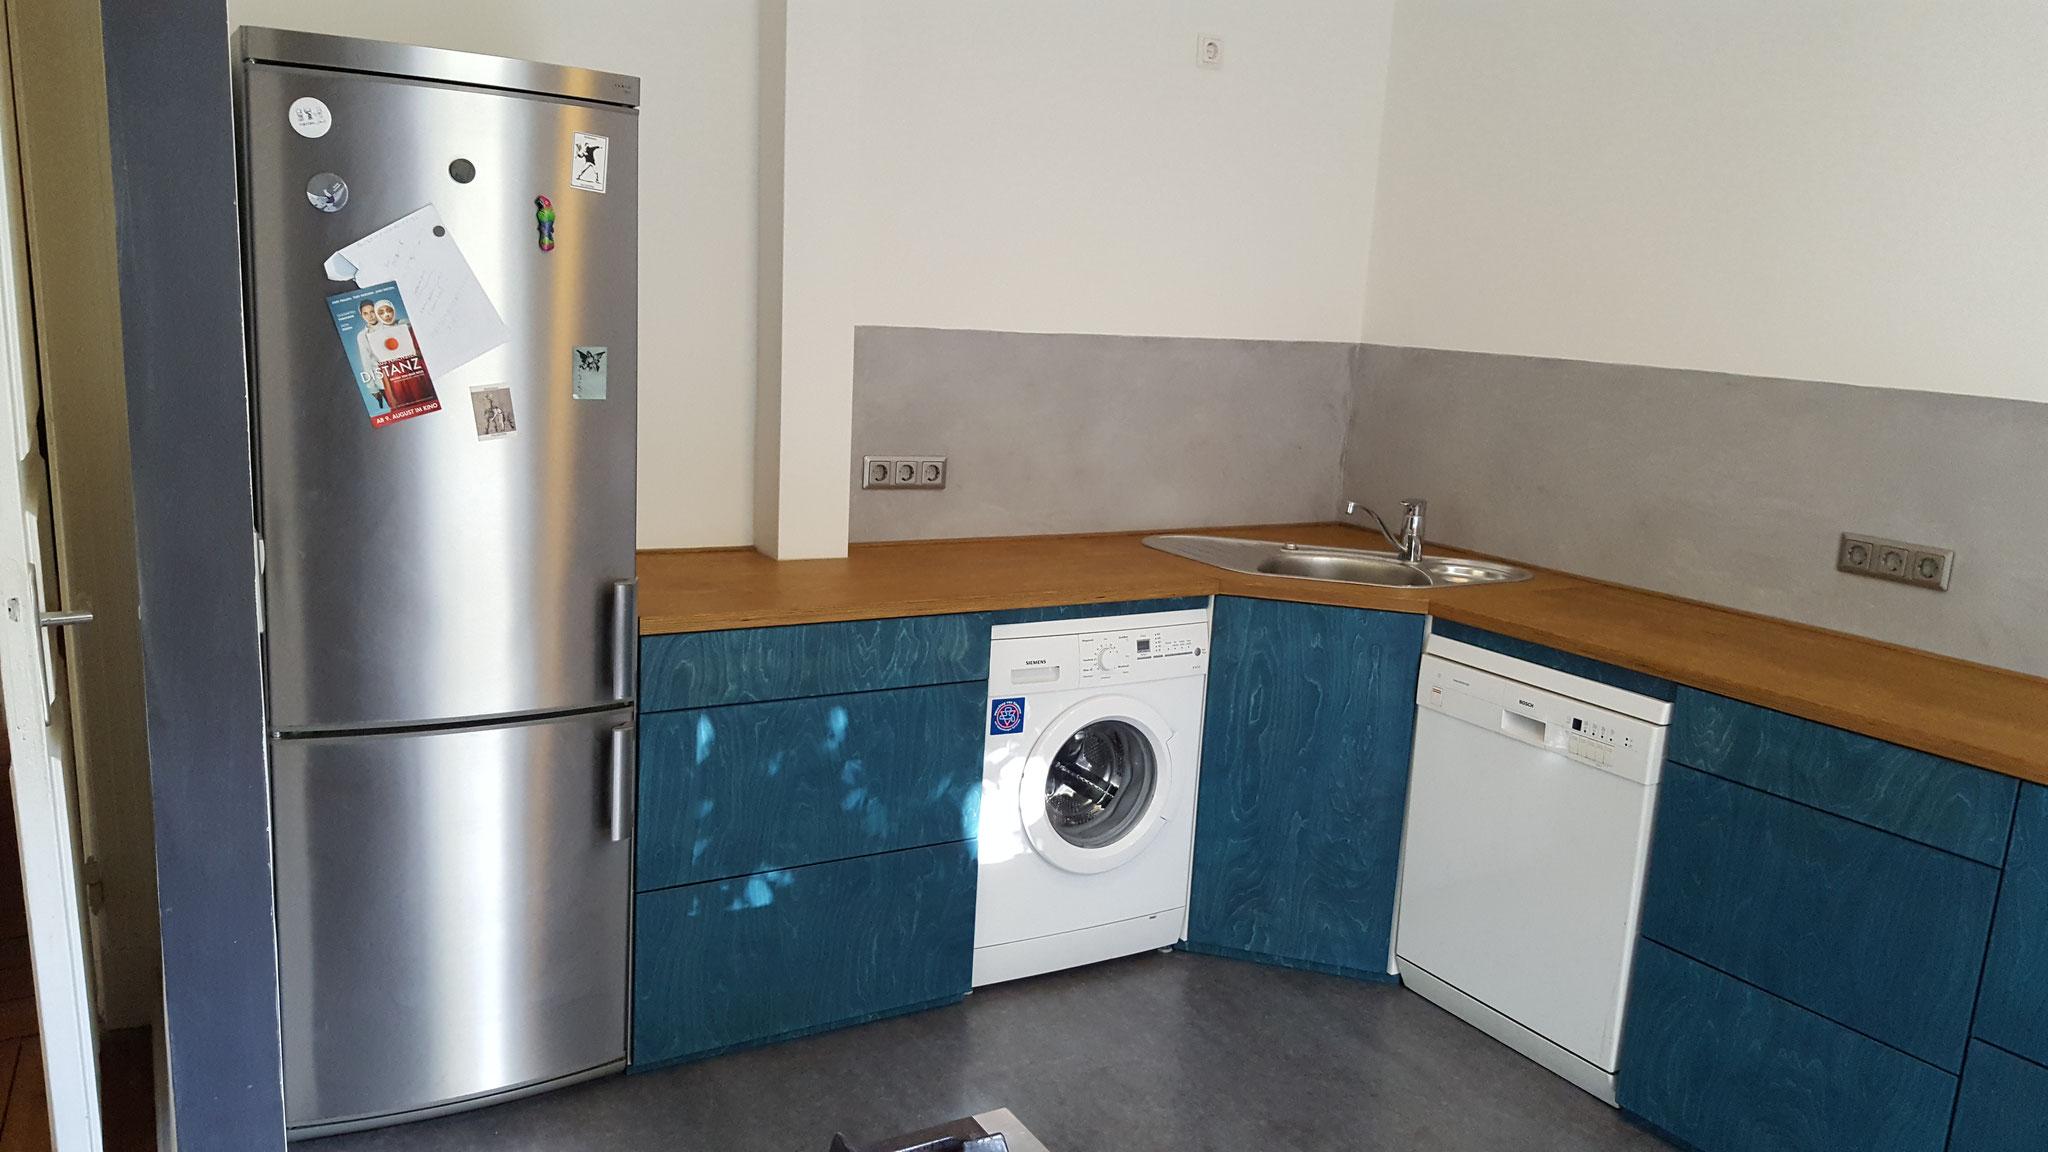 große Küche , Arbeitsplatte Eiche Multiplex, Dark Oak geölt, Fronten grün blau geölt